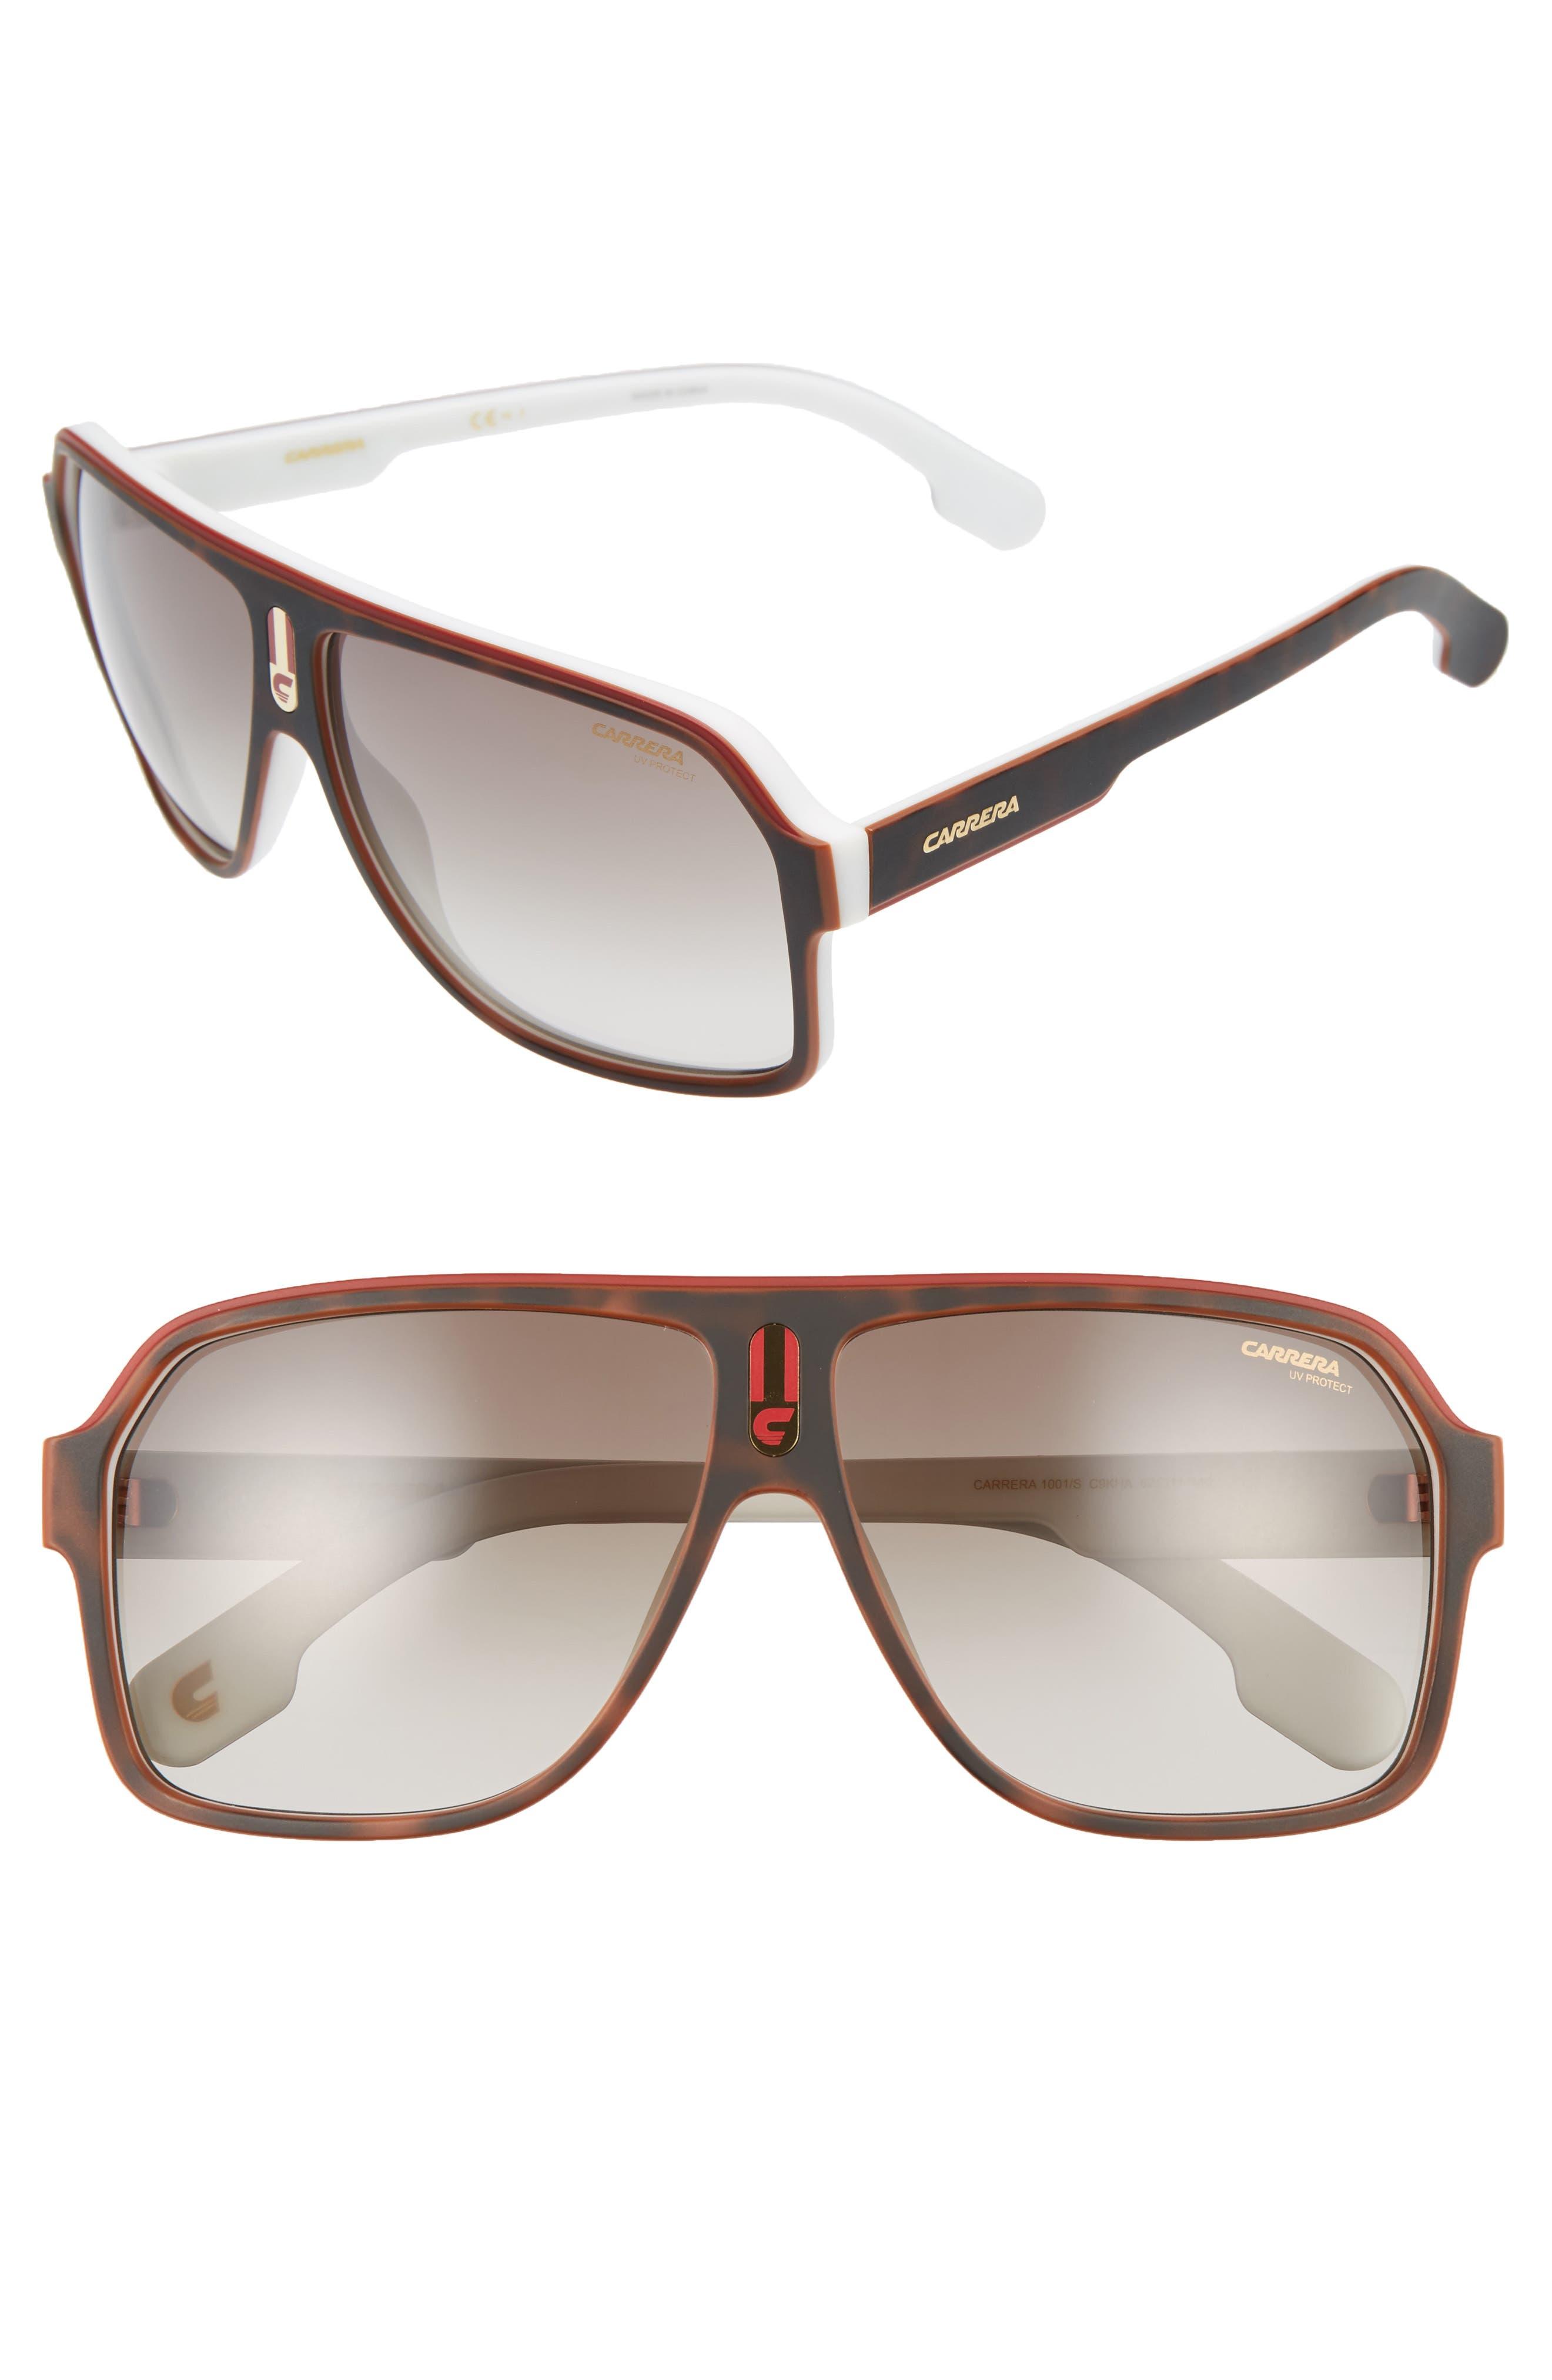 Alternate Image 1 Selected - Carrera Eyewear 1001/S 62mm Sunglasses